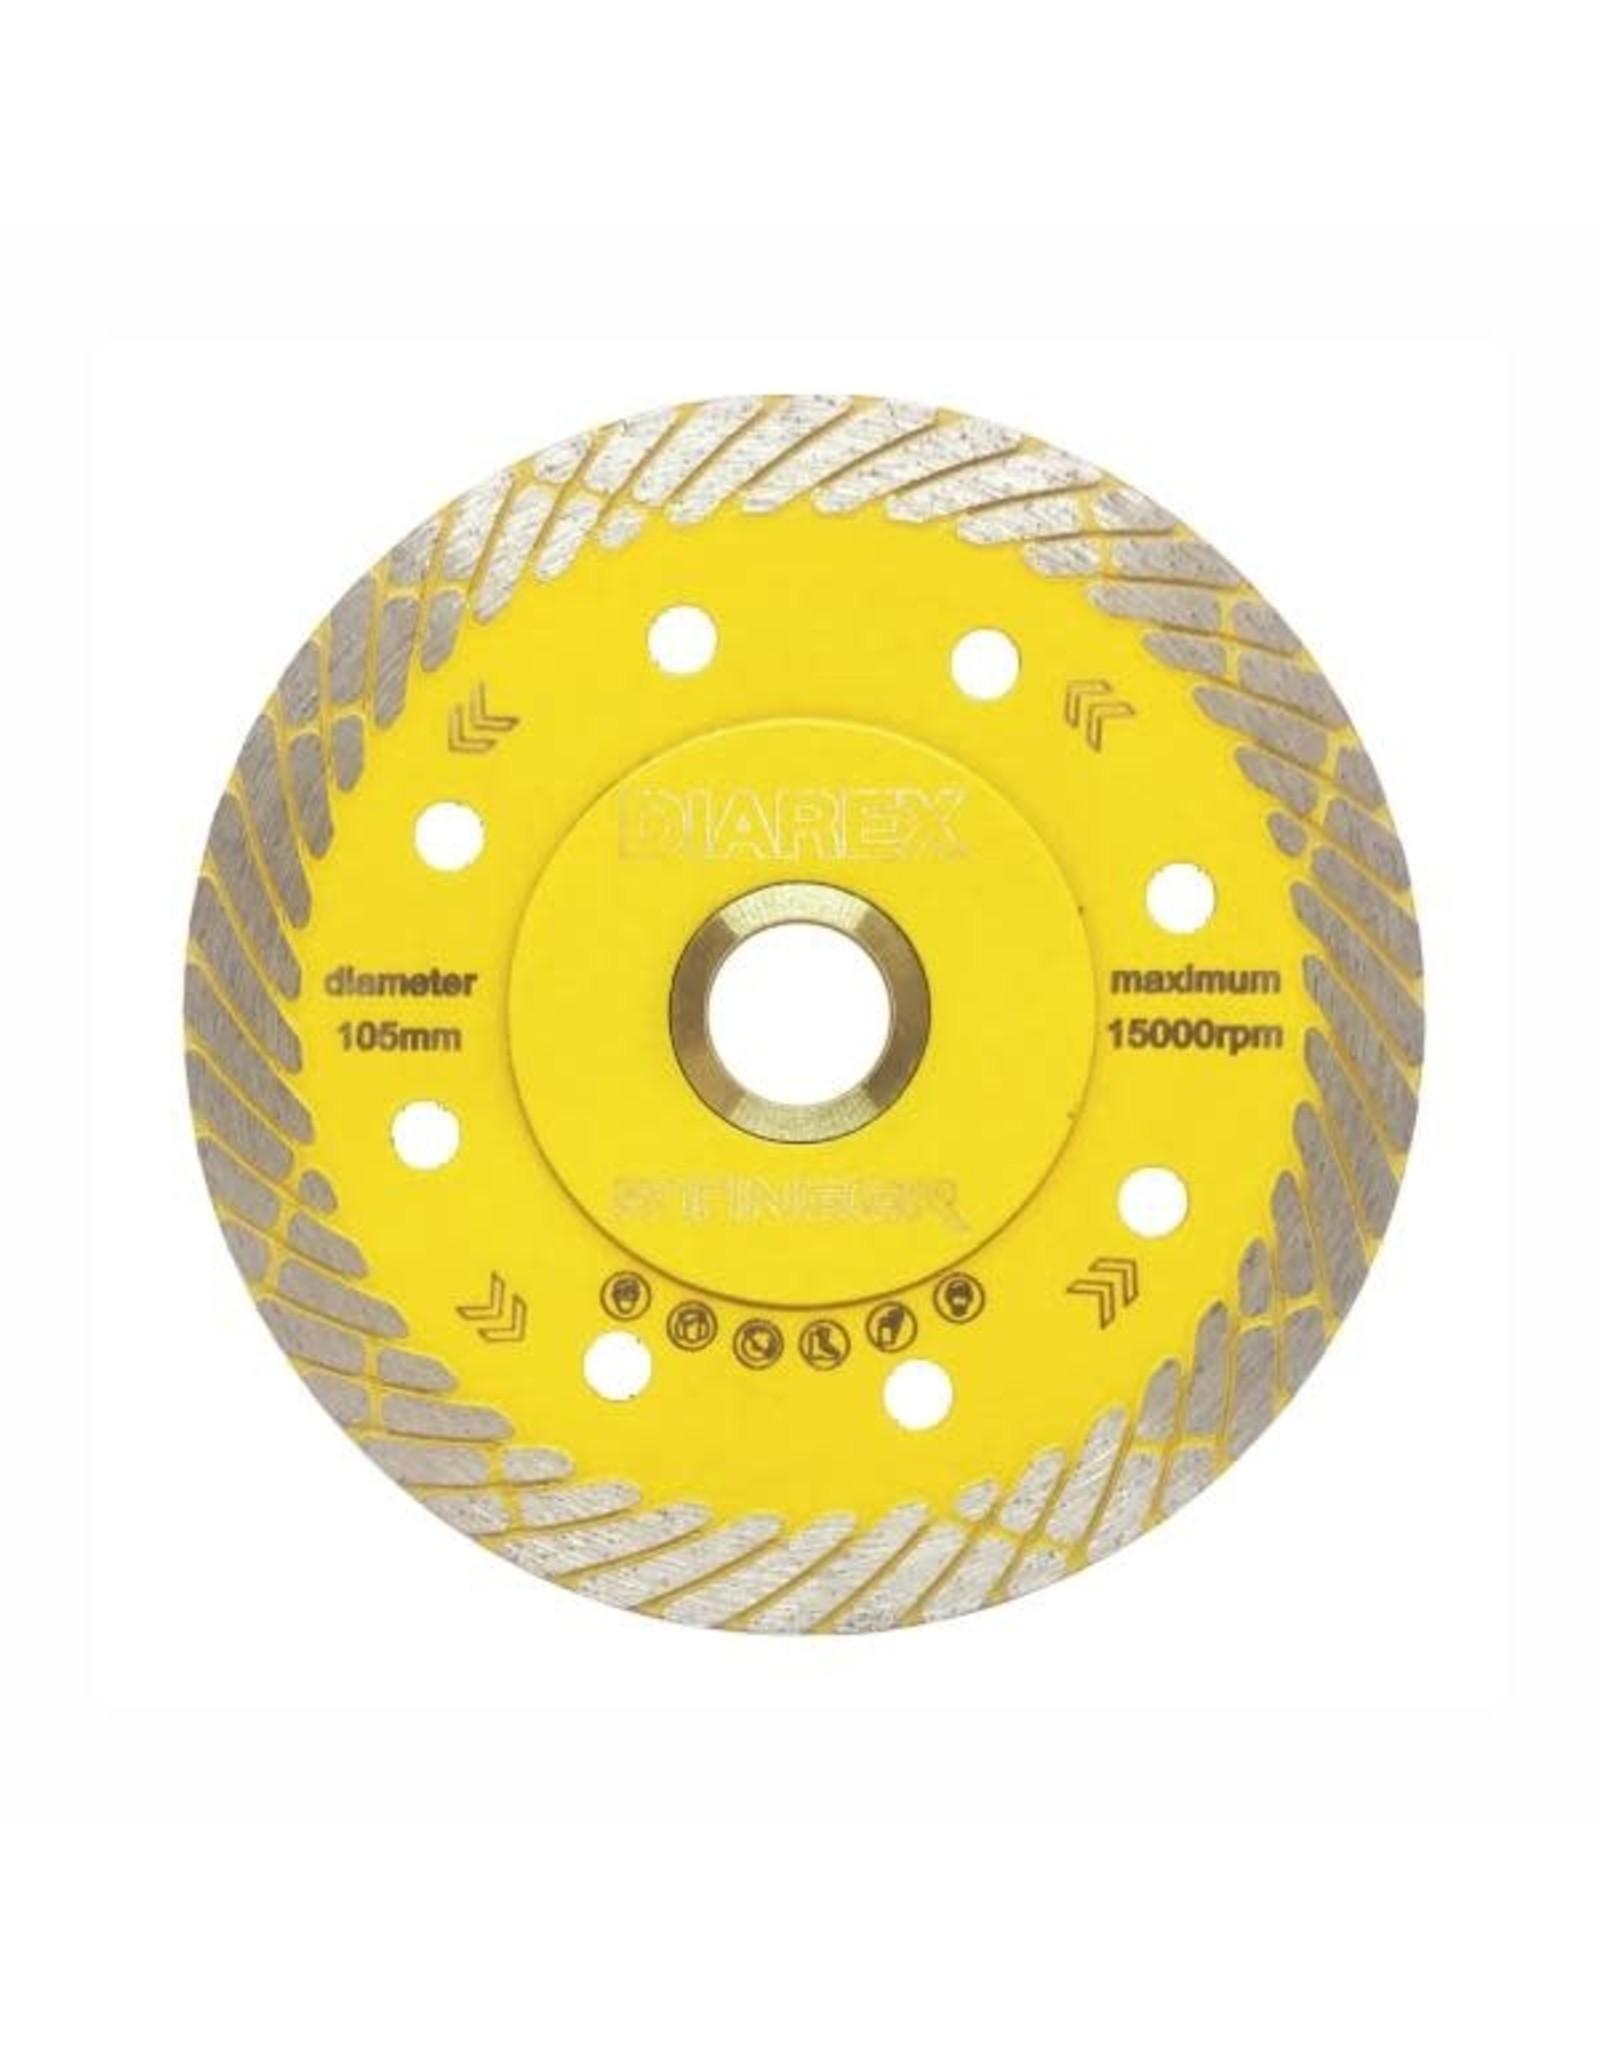 CDK Stone 105mm DIAREX Stinger Ultra Thin Blade